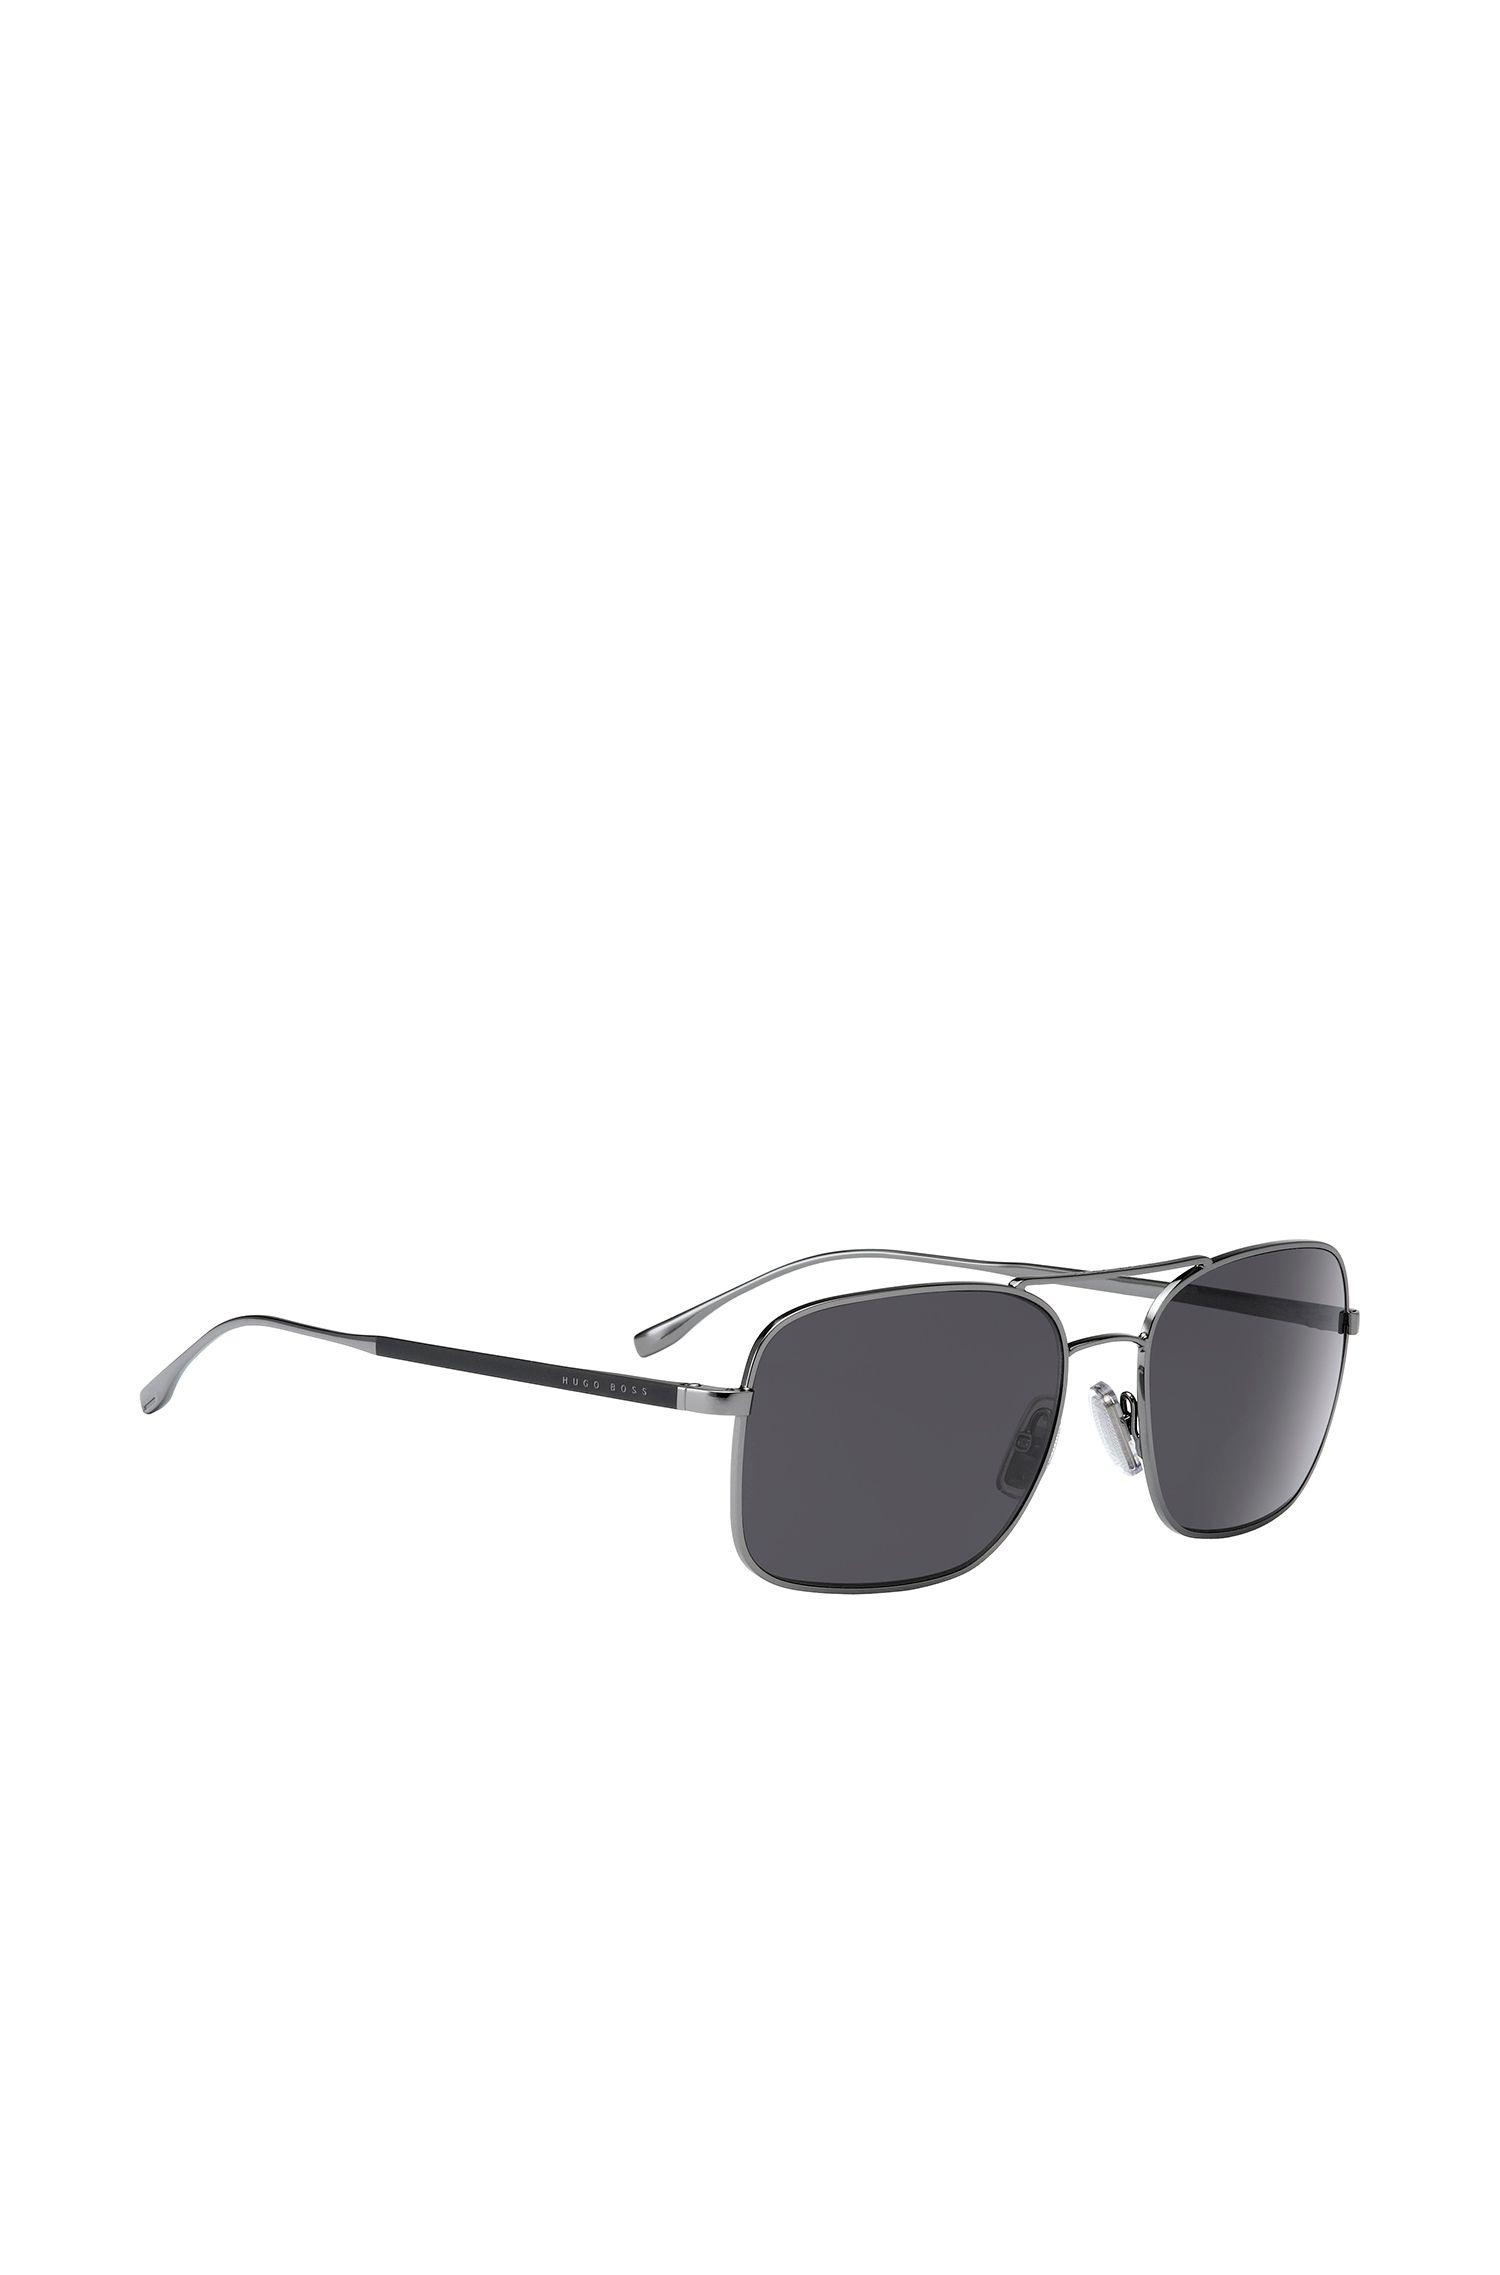 Hoekige zonnebril met smal montuur van metaal: 'BOSS 0781/S'